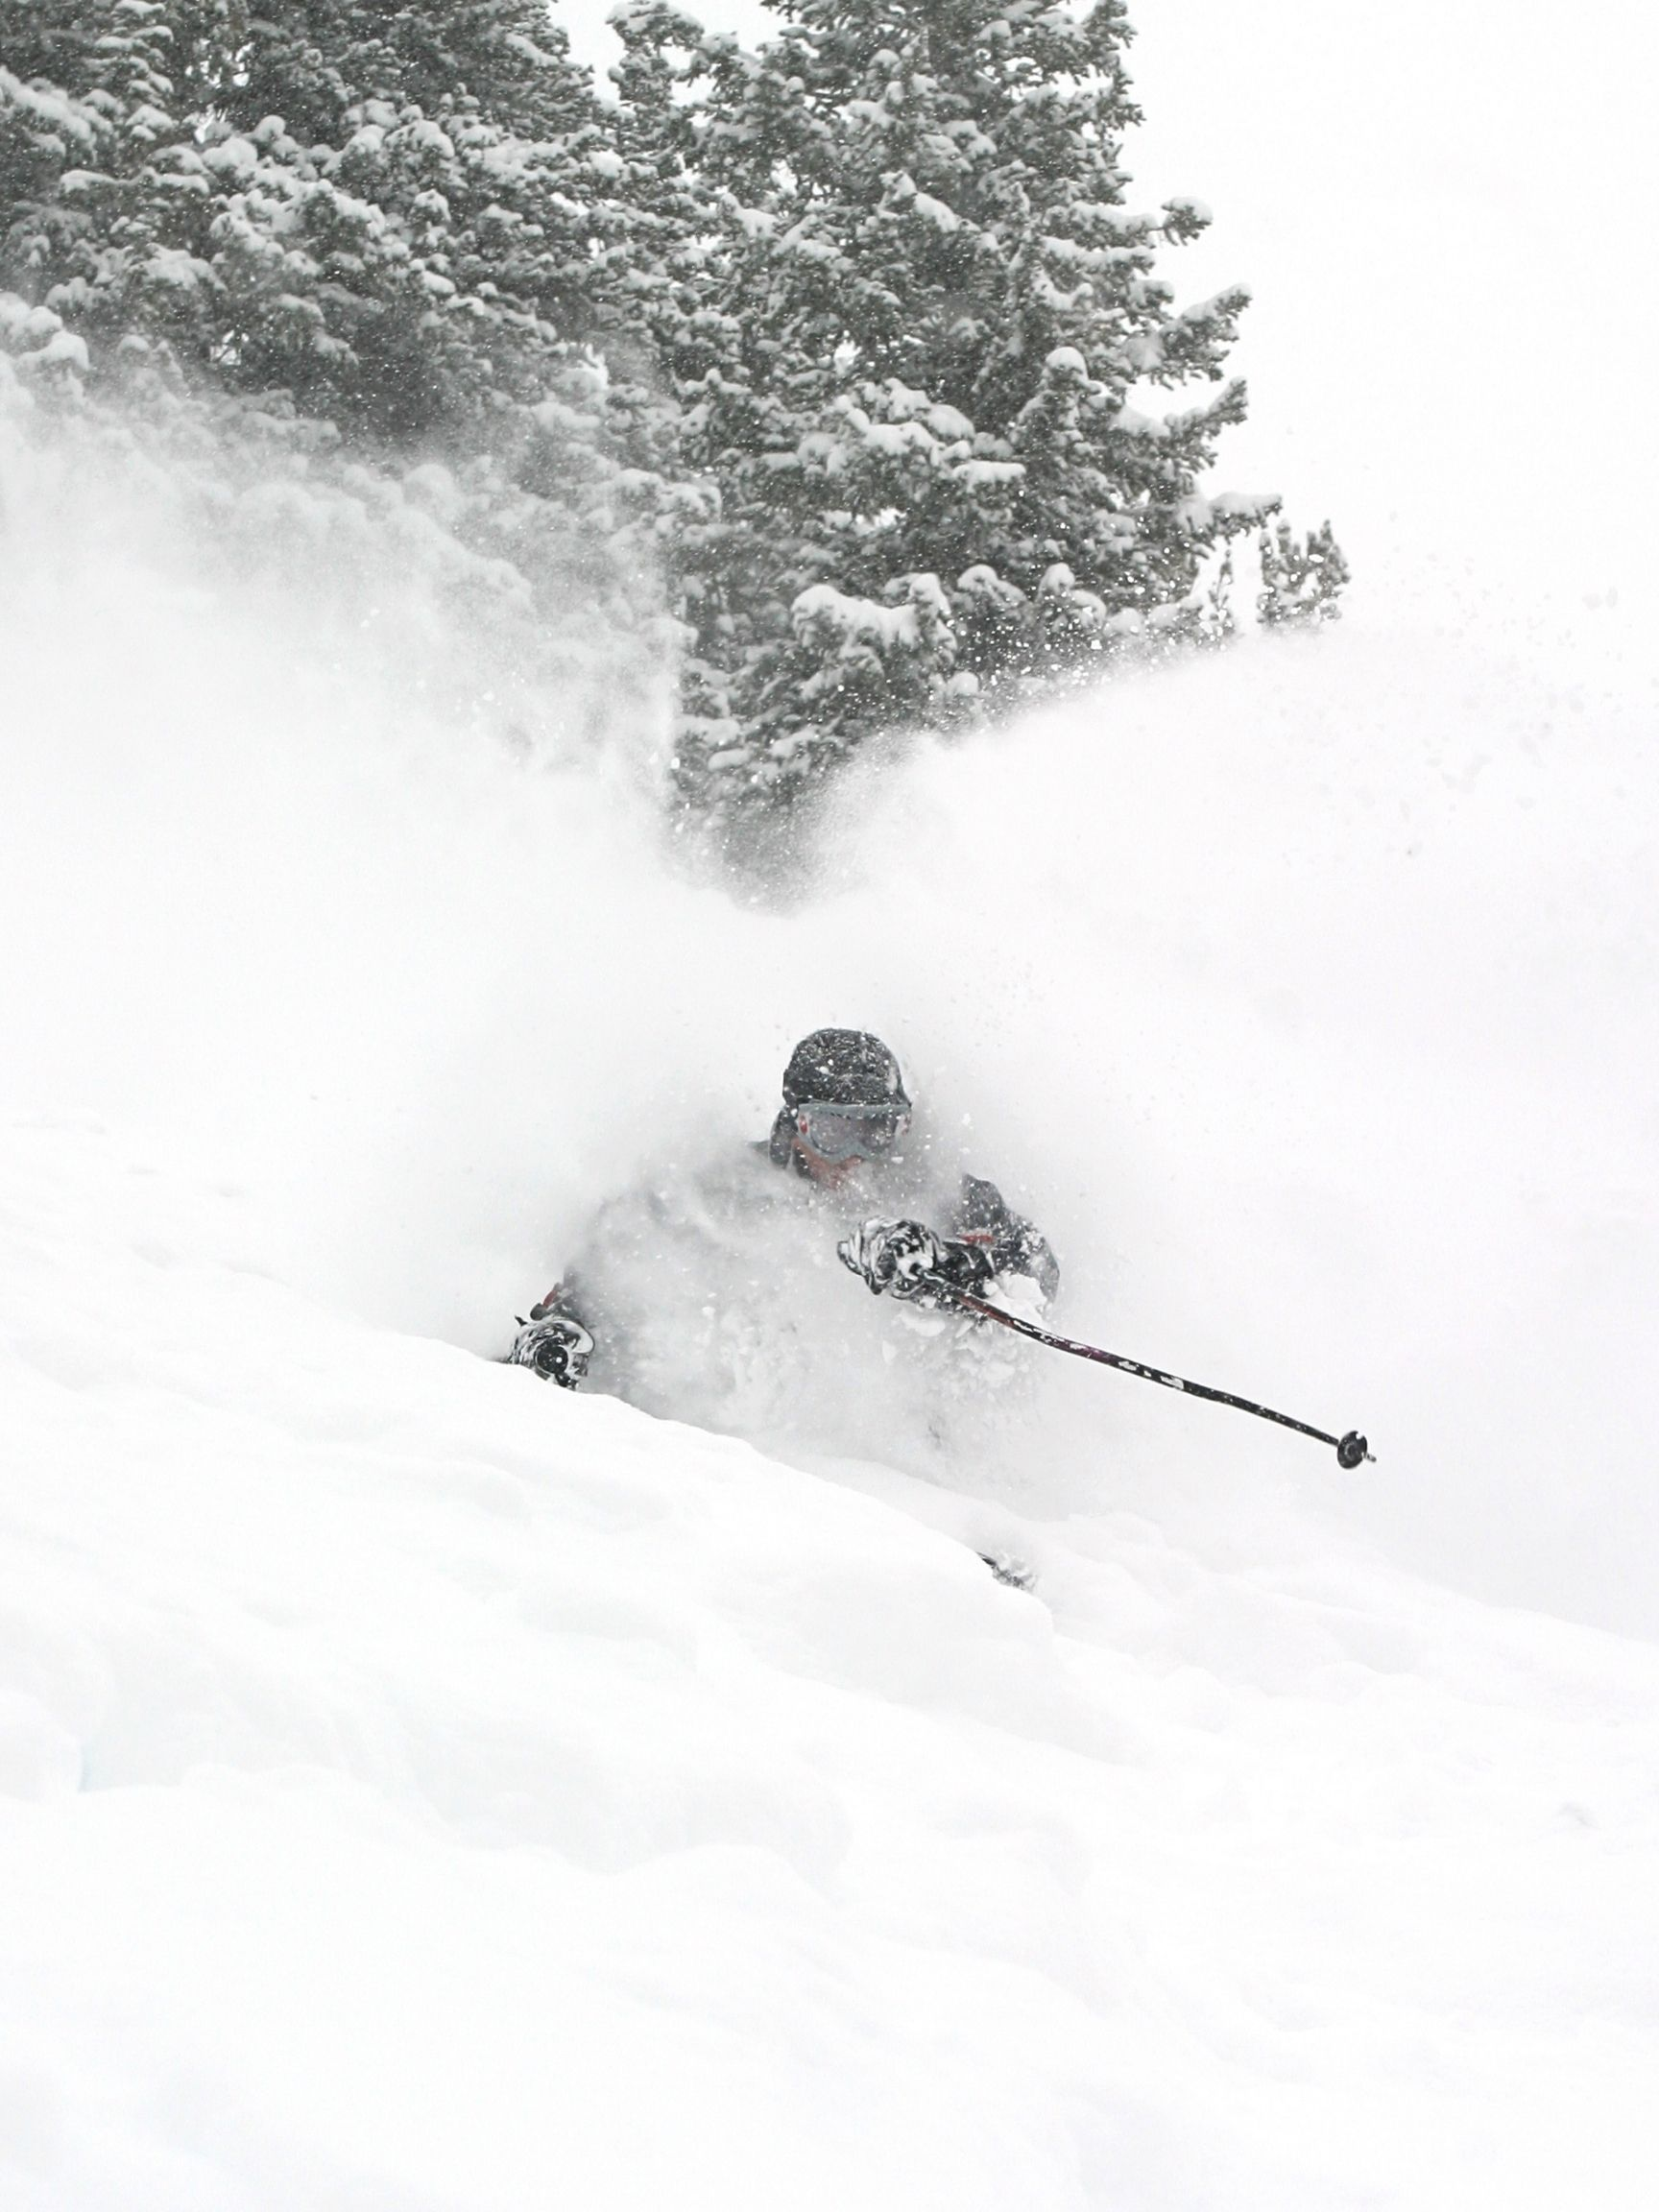 Skiing in Deep Utah Powder